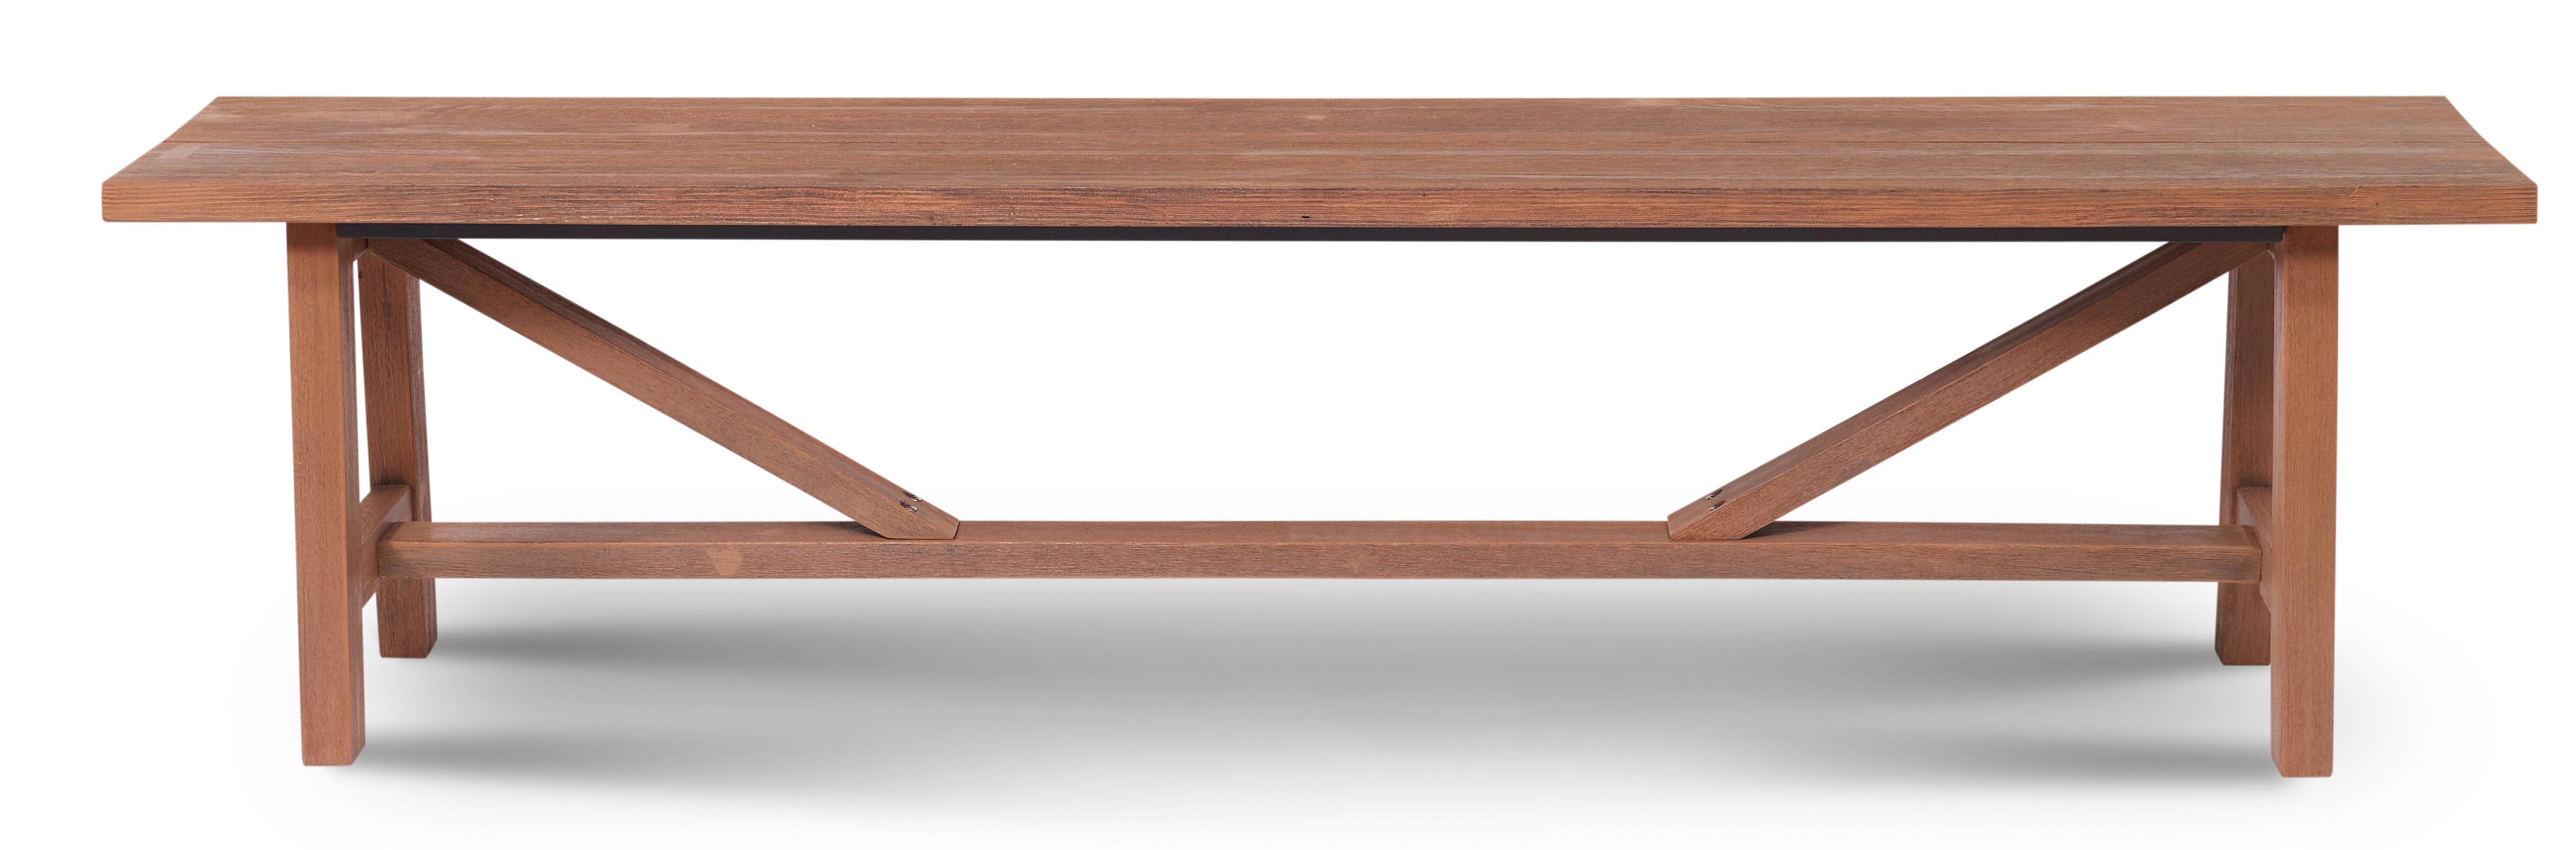 Mcgregor Wooden Picnic Bench